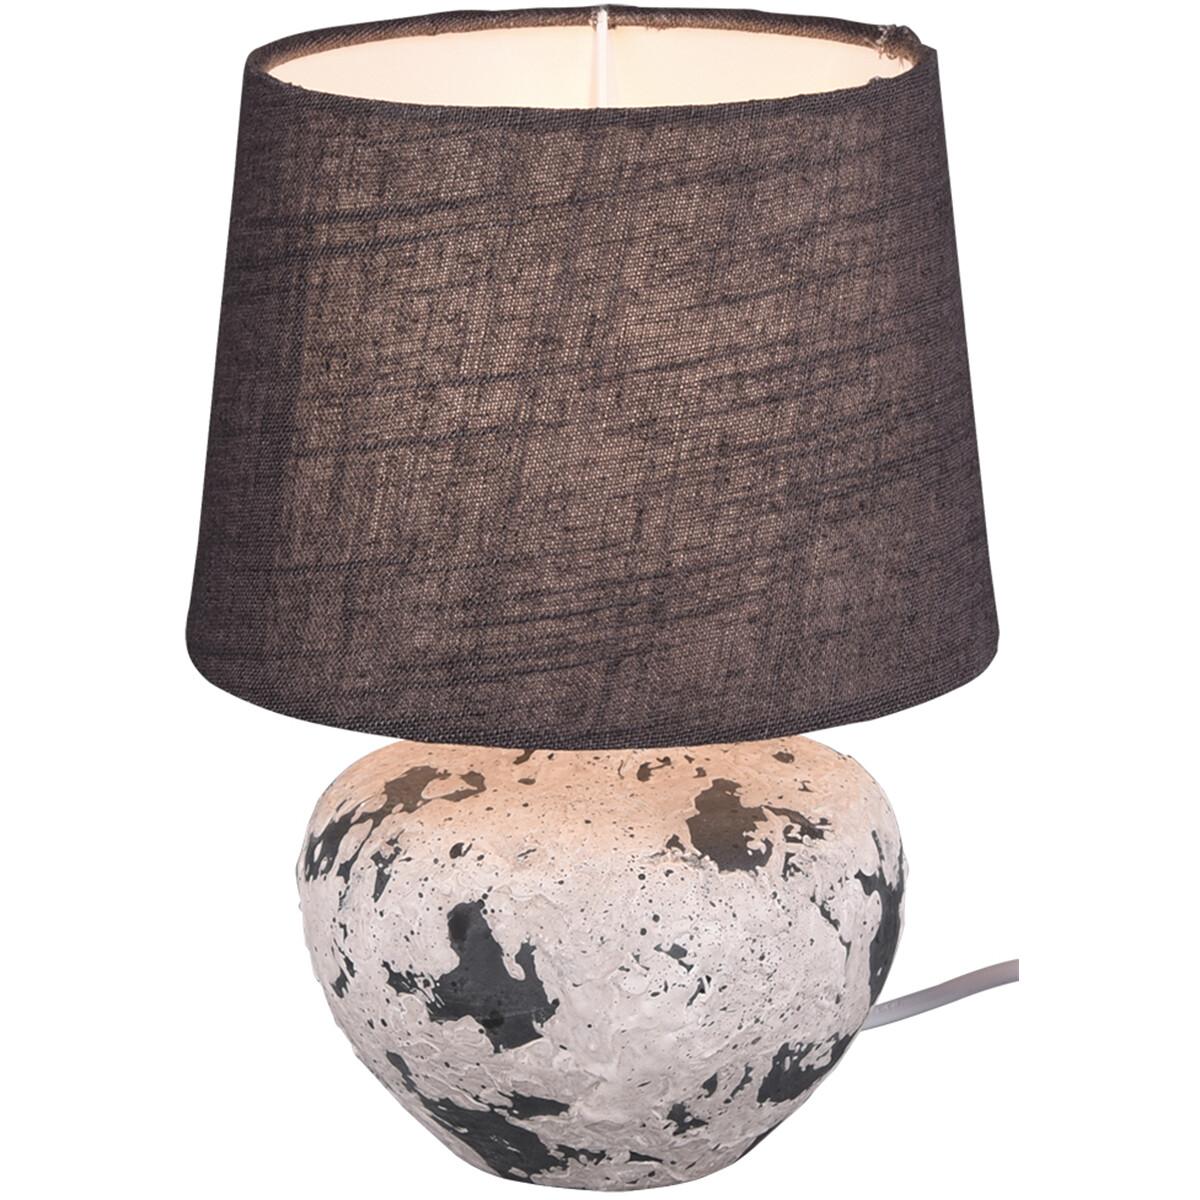 LED Tafellamp - Trion Bae - E14 Fitting - Rond - Mat Grijs - Keramiek